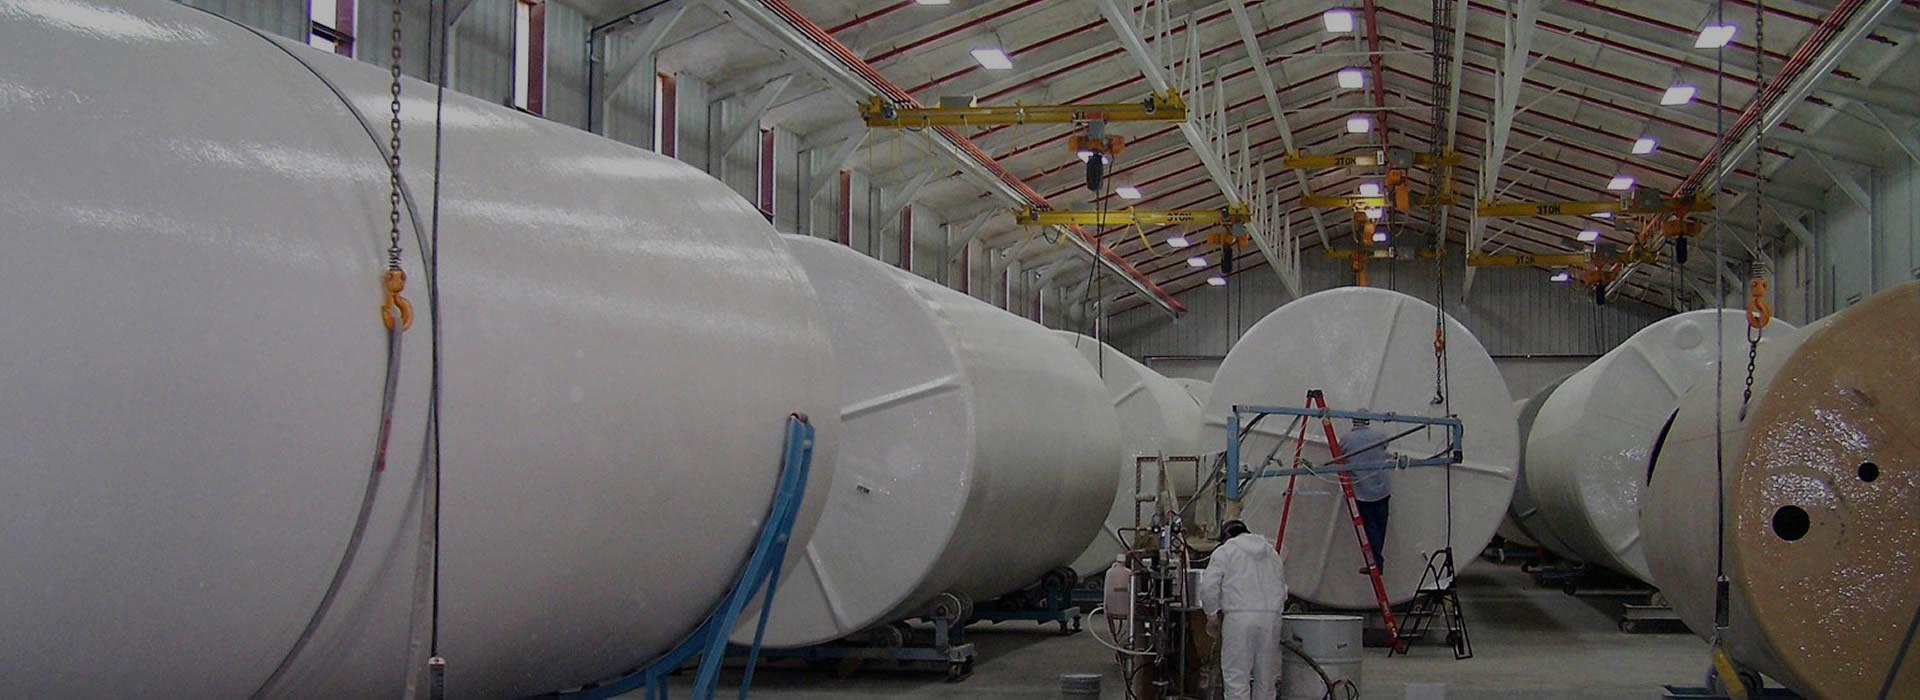 Specially Engineered Polyethylene Industrial Tanks with Bund